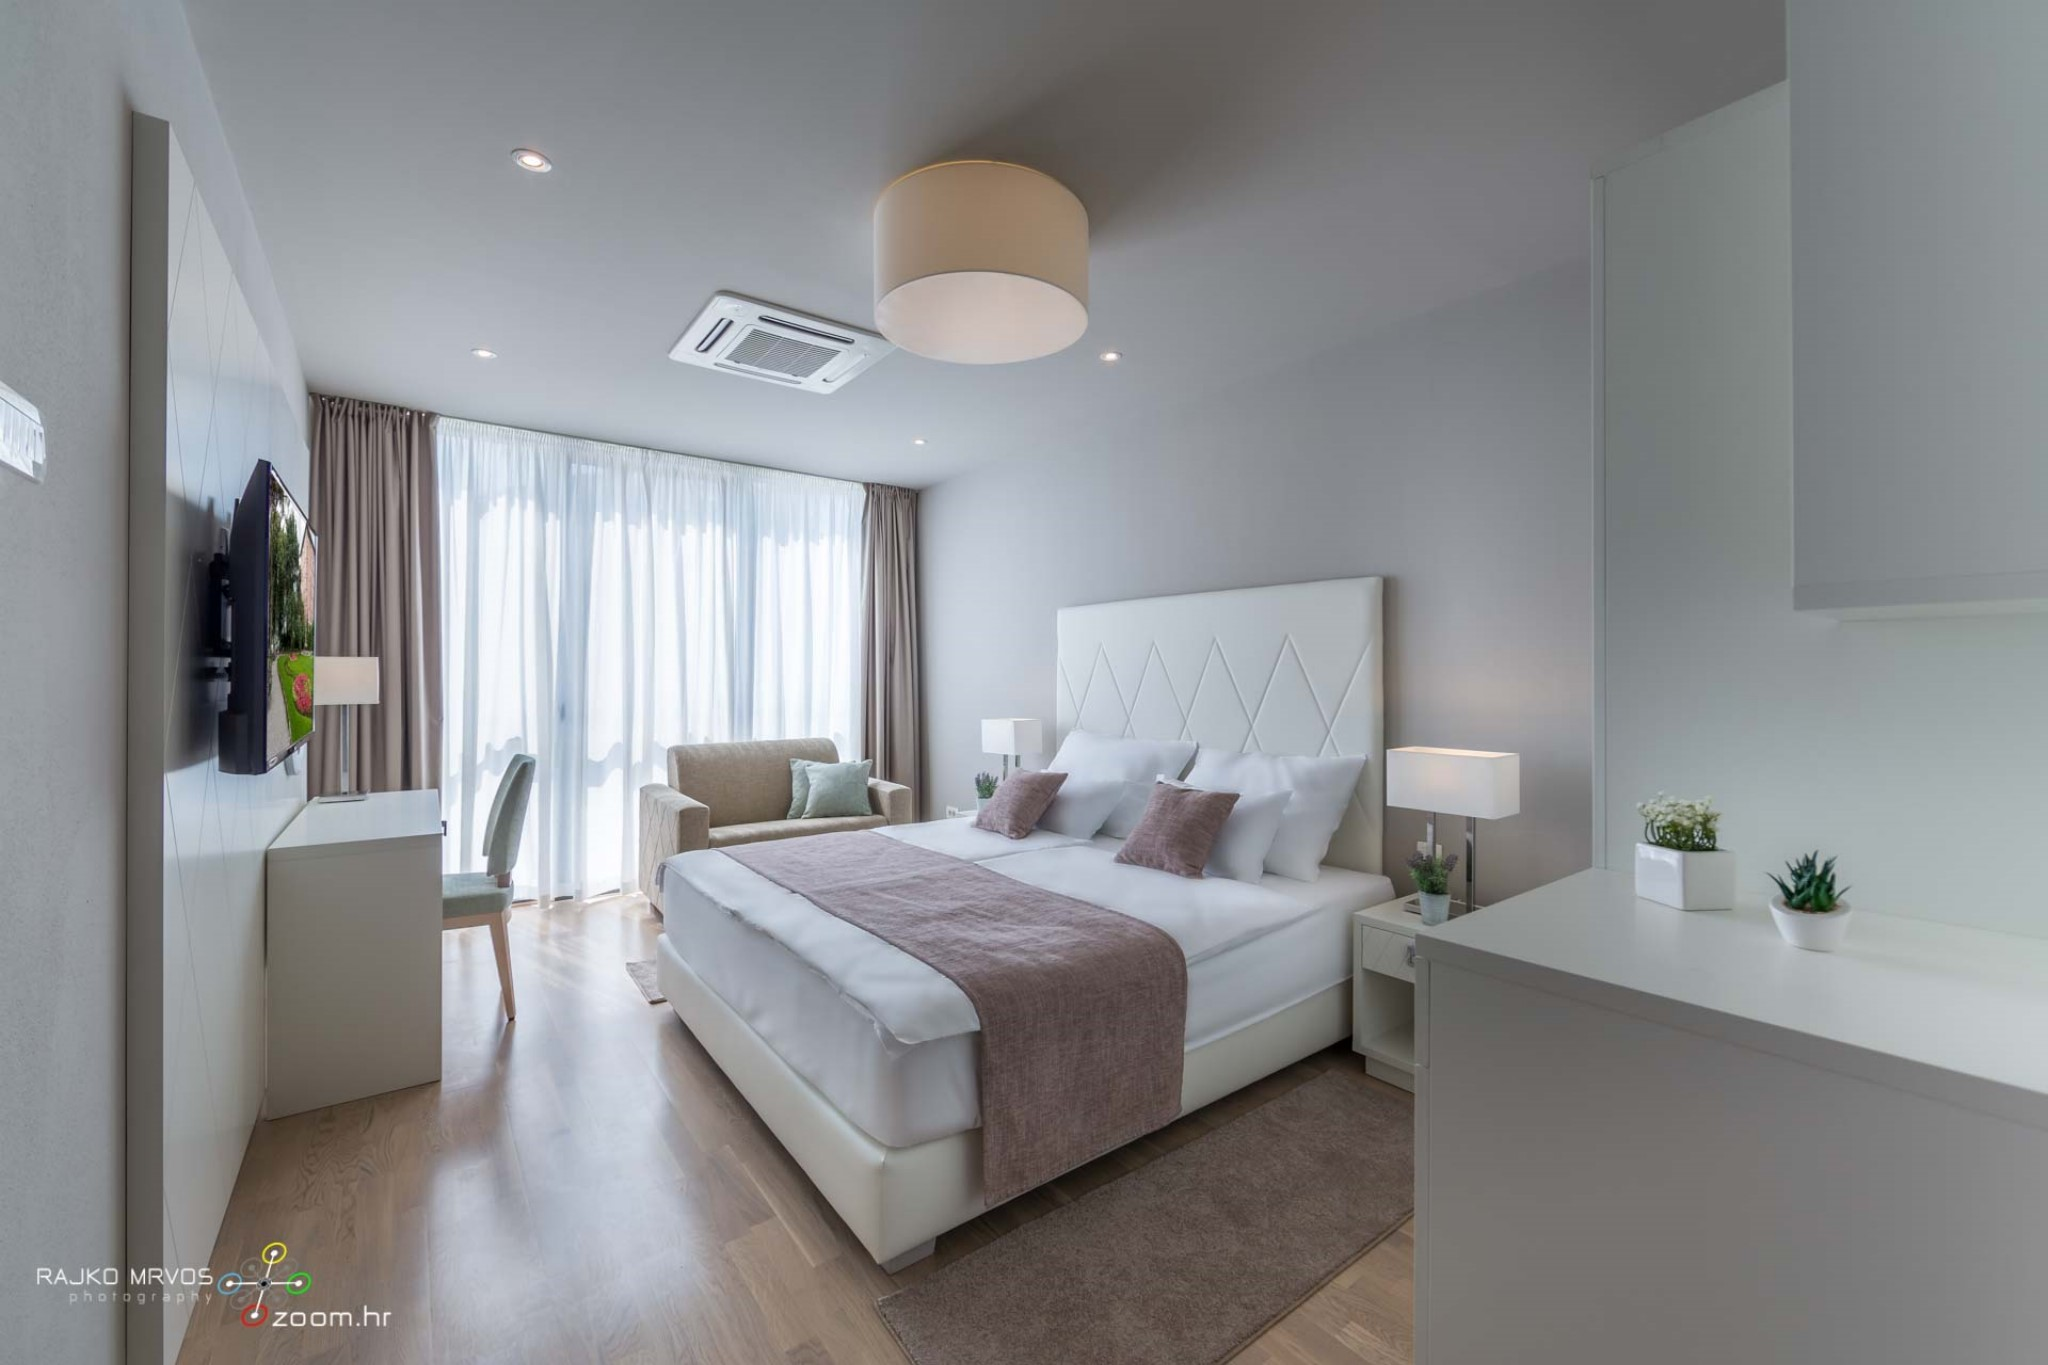 fotografiranje-interijera-fotograf-eksterijera-apartmana-vila-kuca-apartmani-Preelook-83